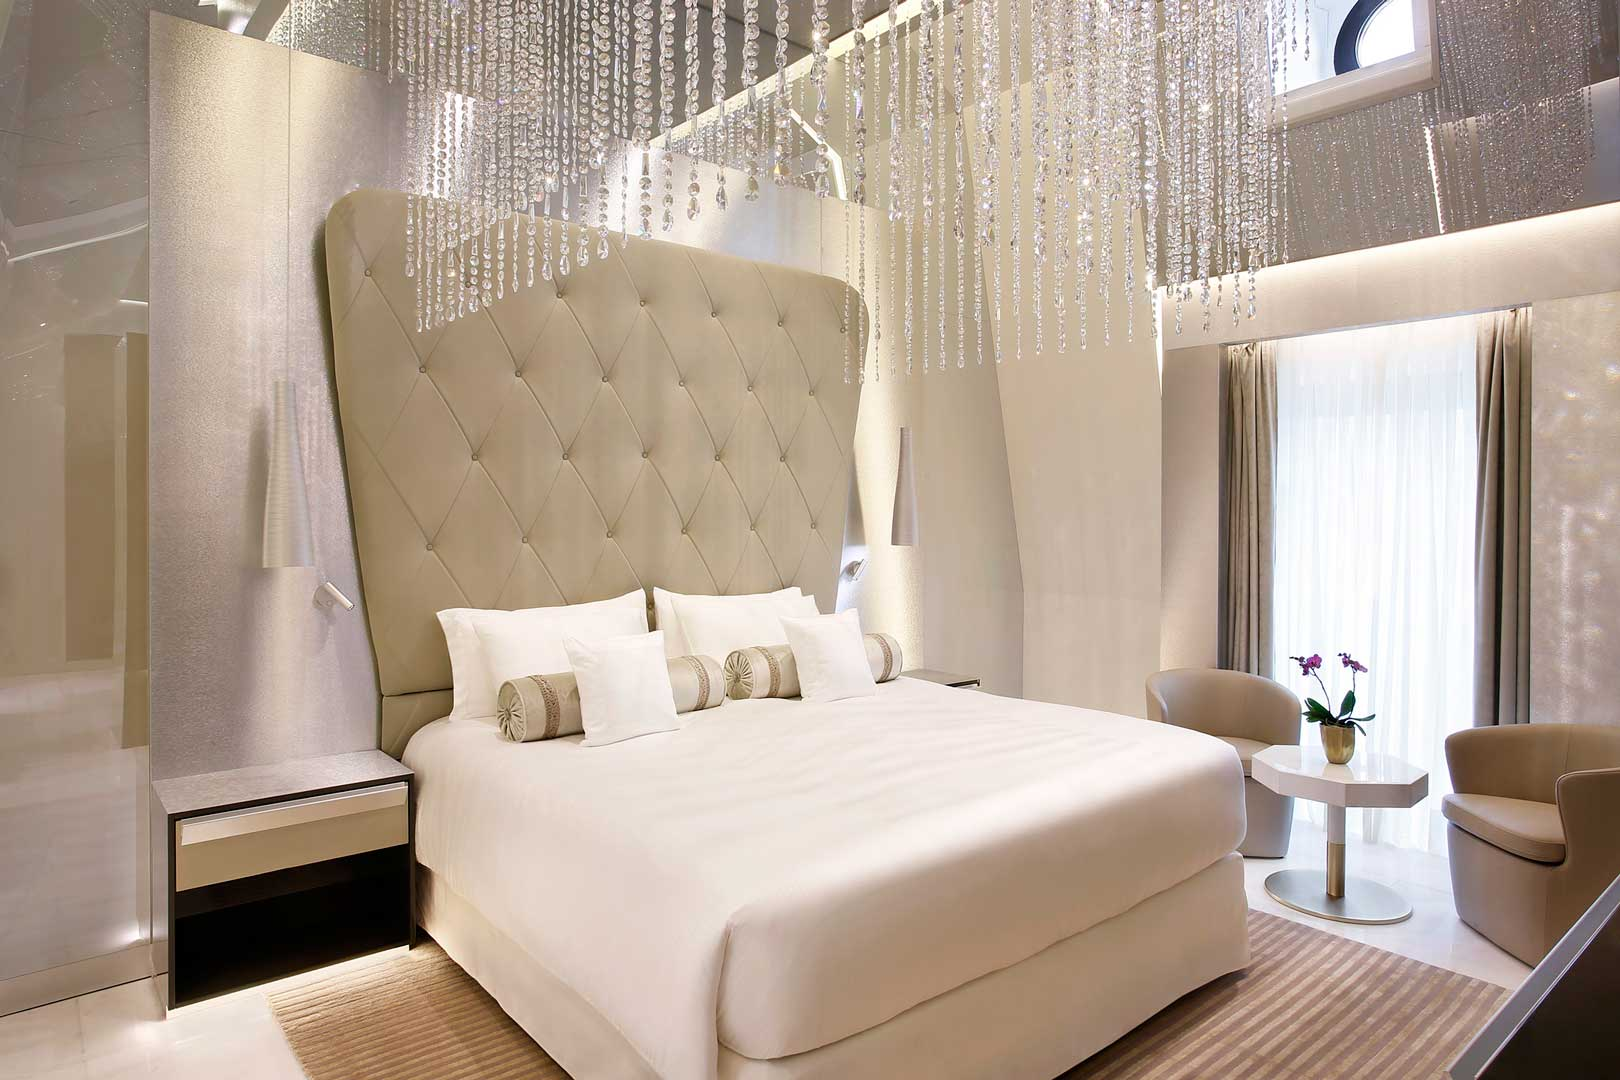 Excelsior Hotel Gallia | Katara Suite - Princess Room